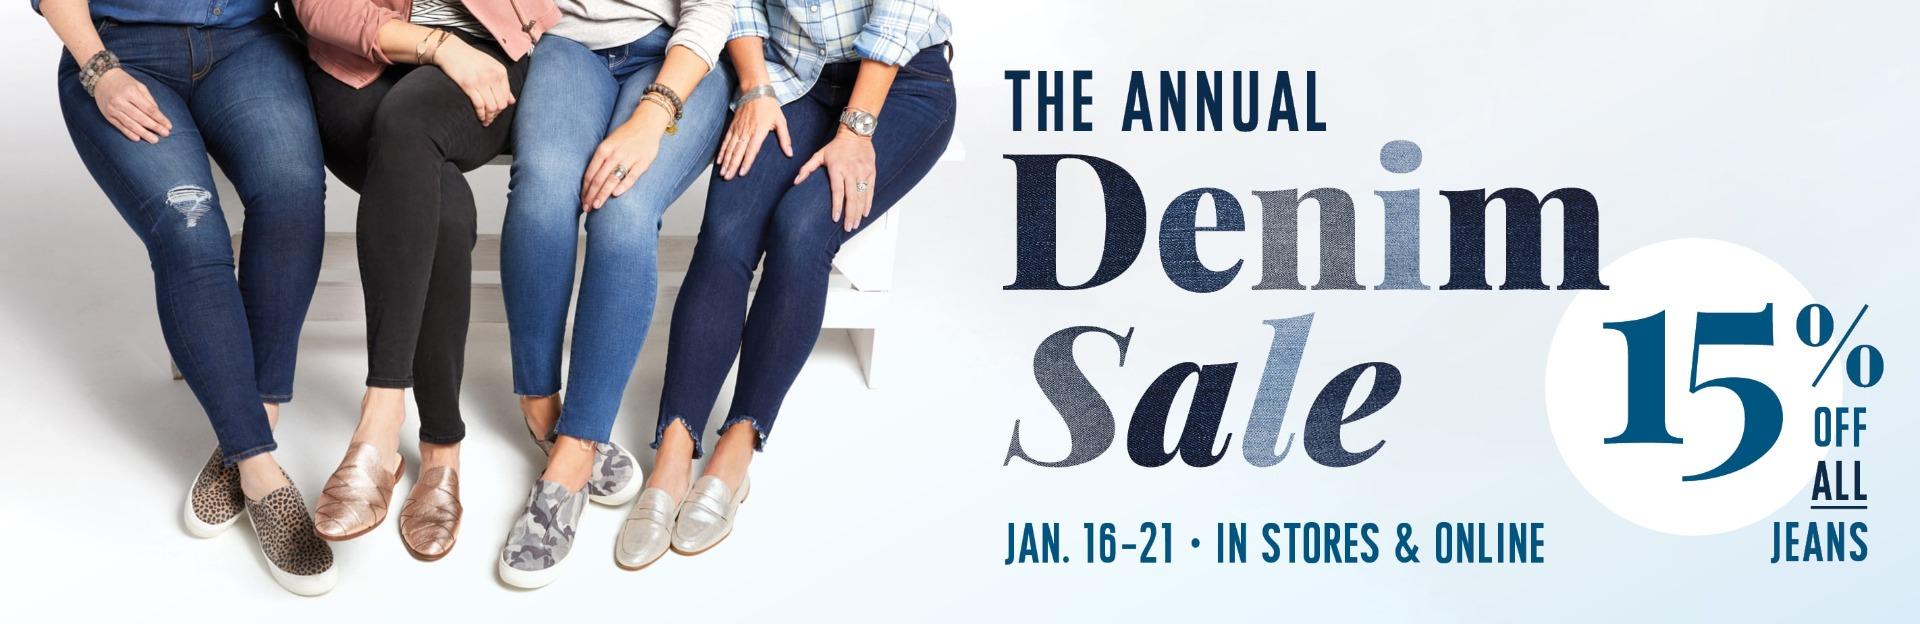 3608f7039d6 Shop Annual Denim Sale - EVEREVE - a contemporary fashion and ...